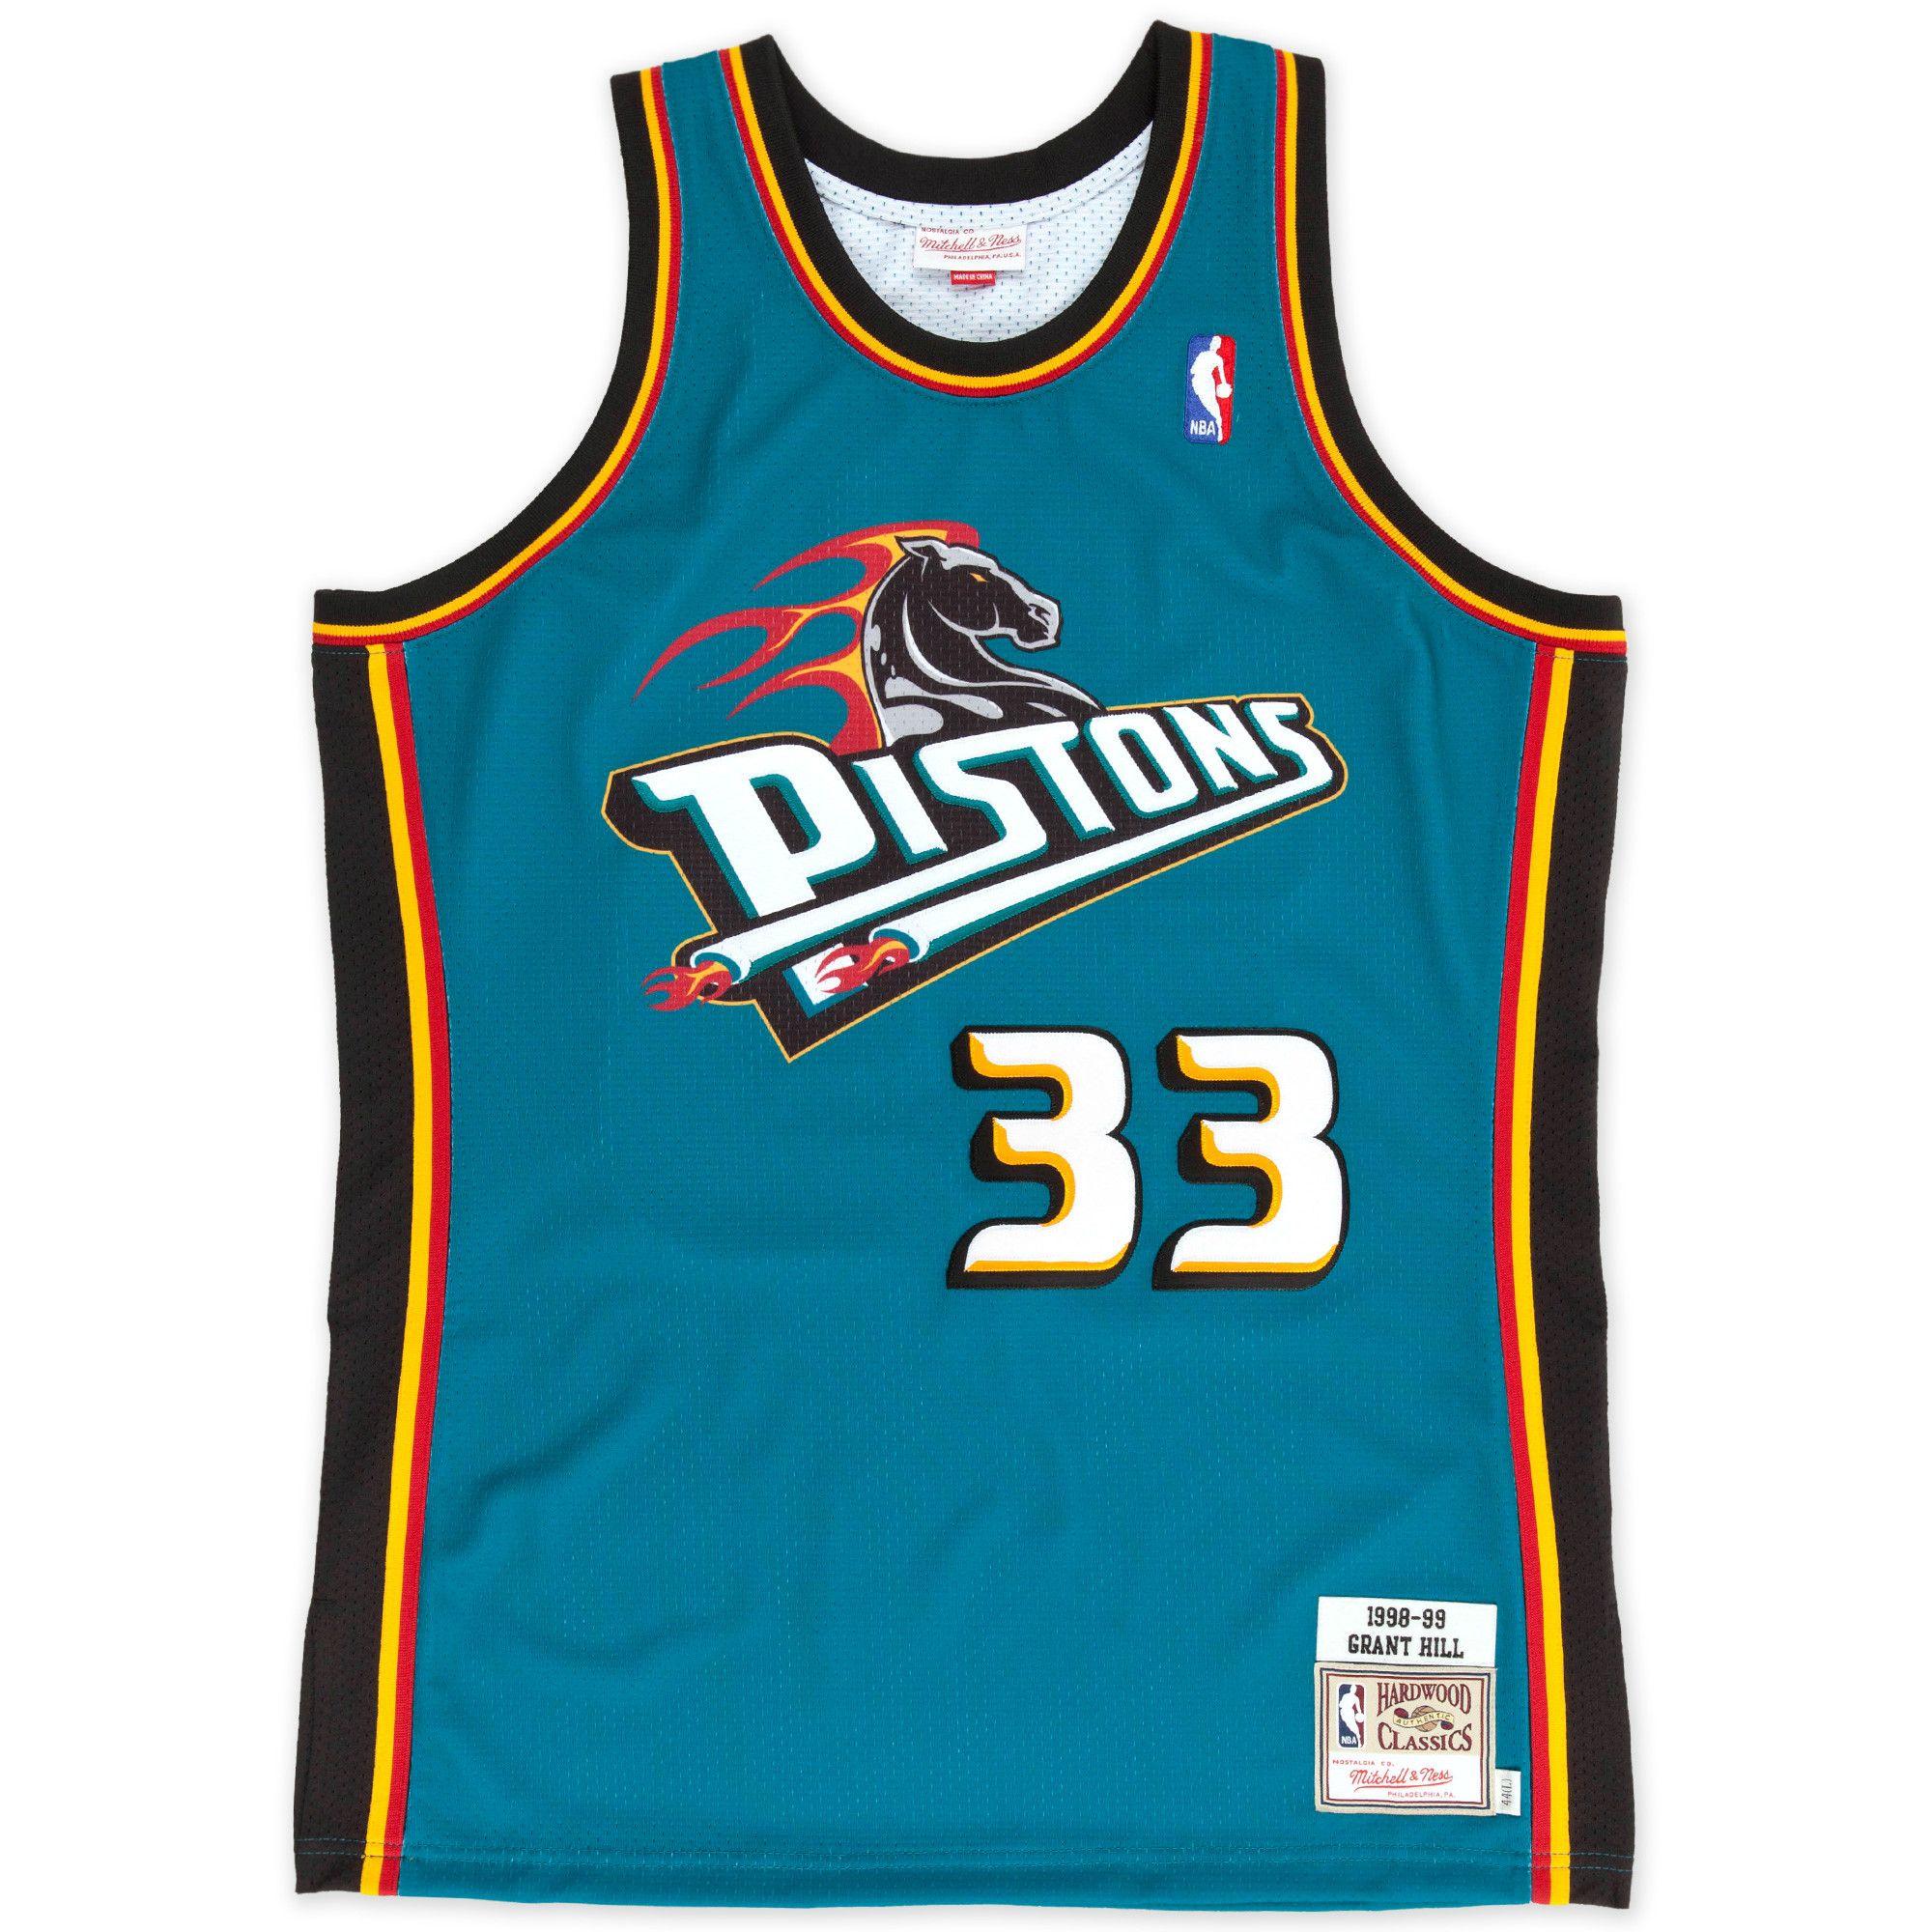 Grant Hill 1998 99 Authentic Jersey Detroit Pistons Mitchell Ness Nostalgia Co Detroit Pistons Nba Jersey Jersey